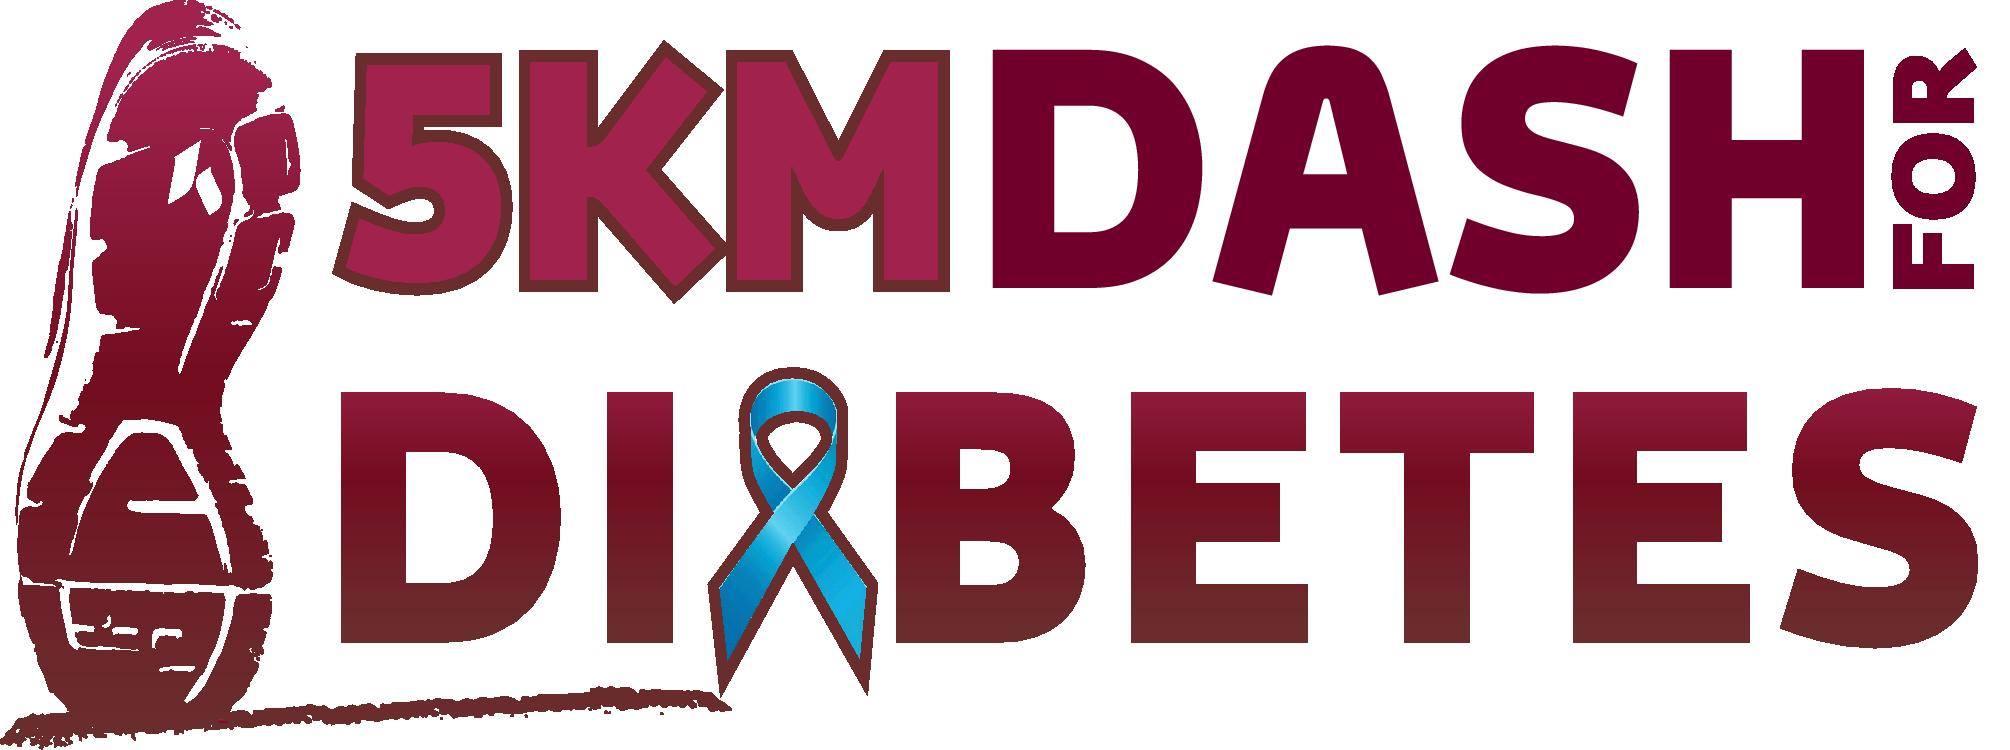 Petero Civoniceva Foundation Dash for Diabetes 5km run